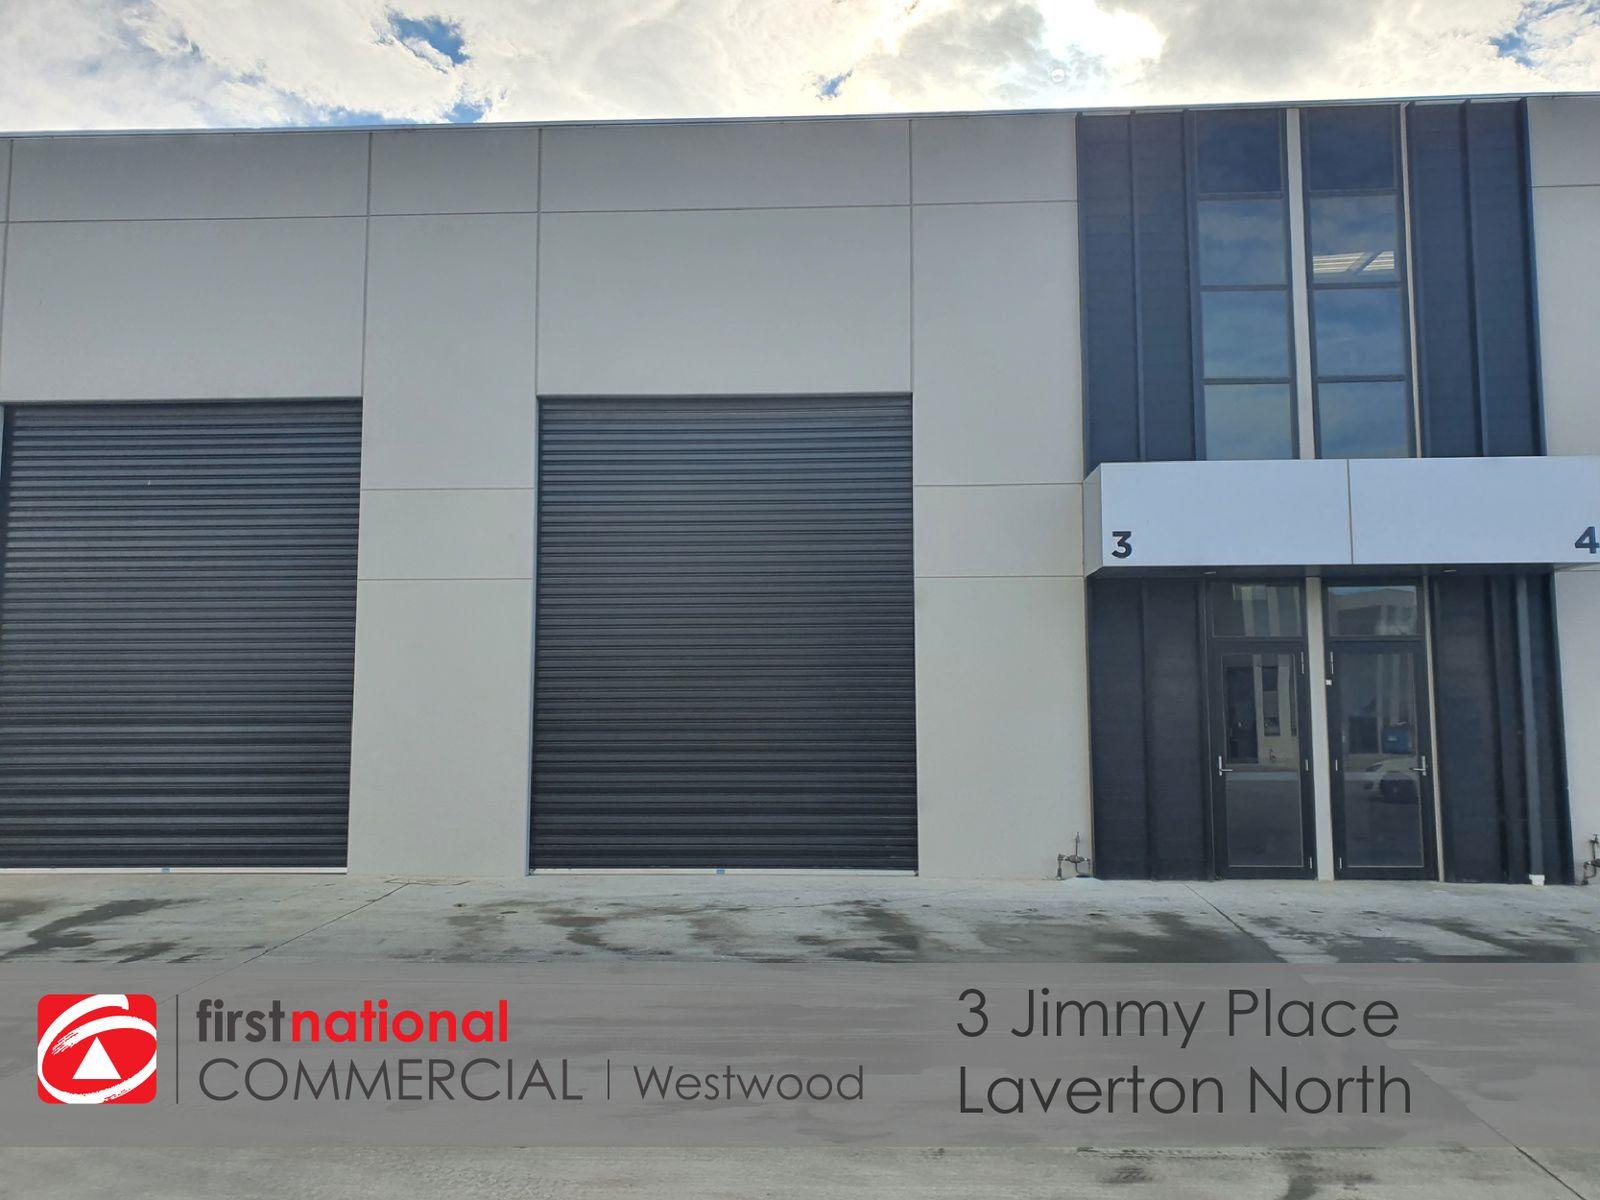 3 Jimmy Place, Laverton North, VIC 3026